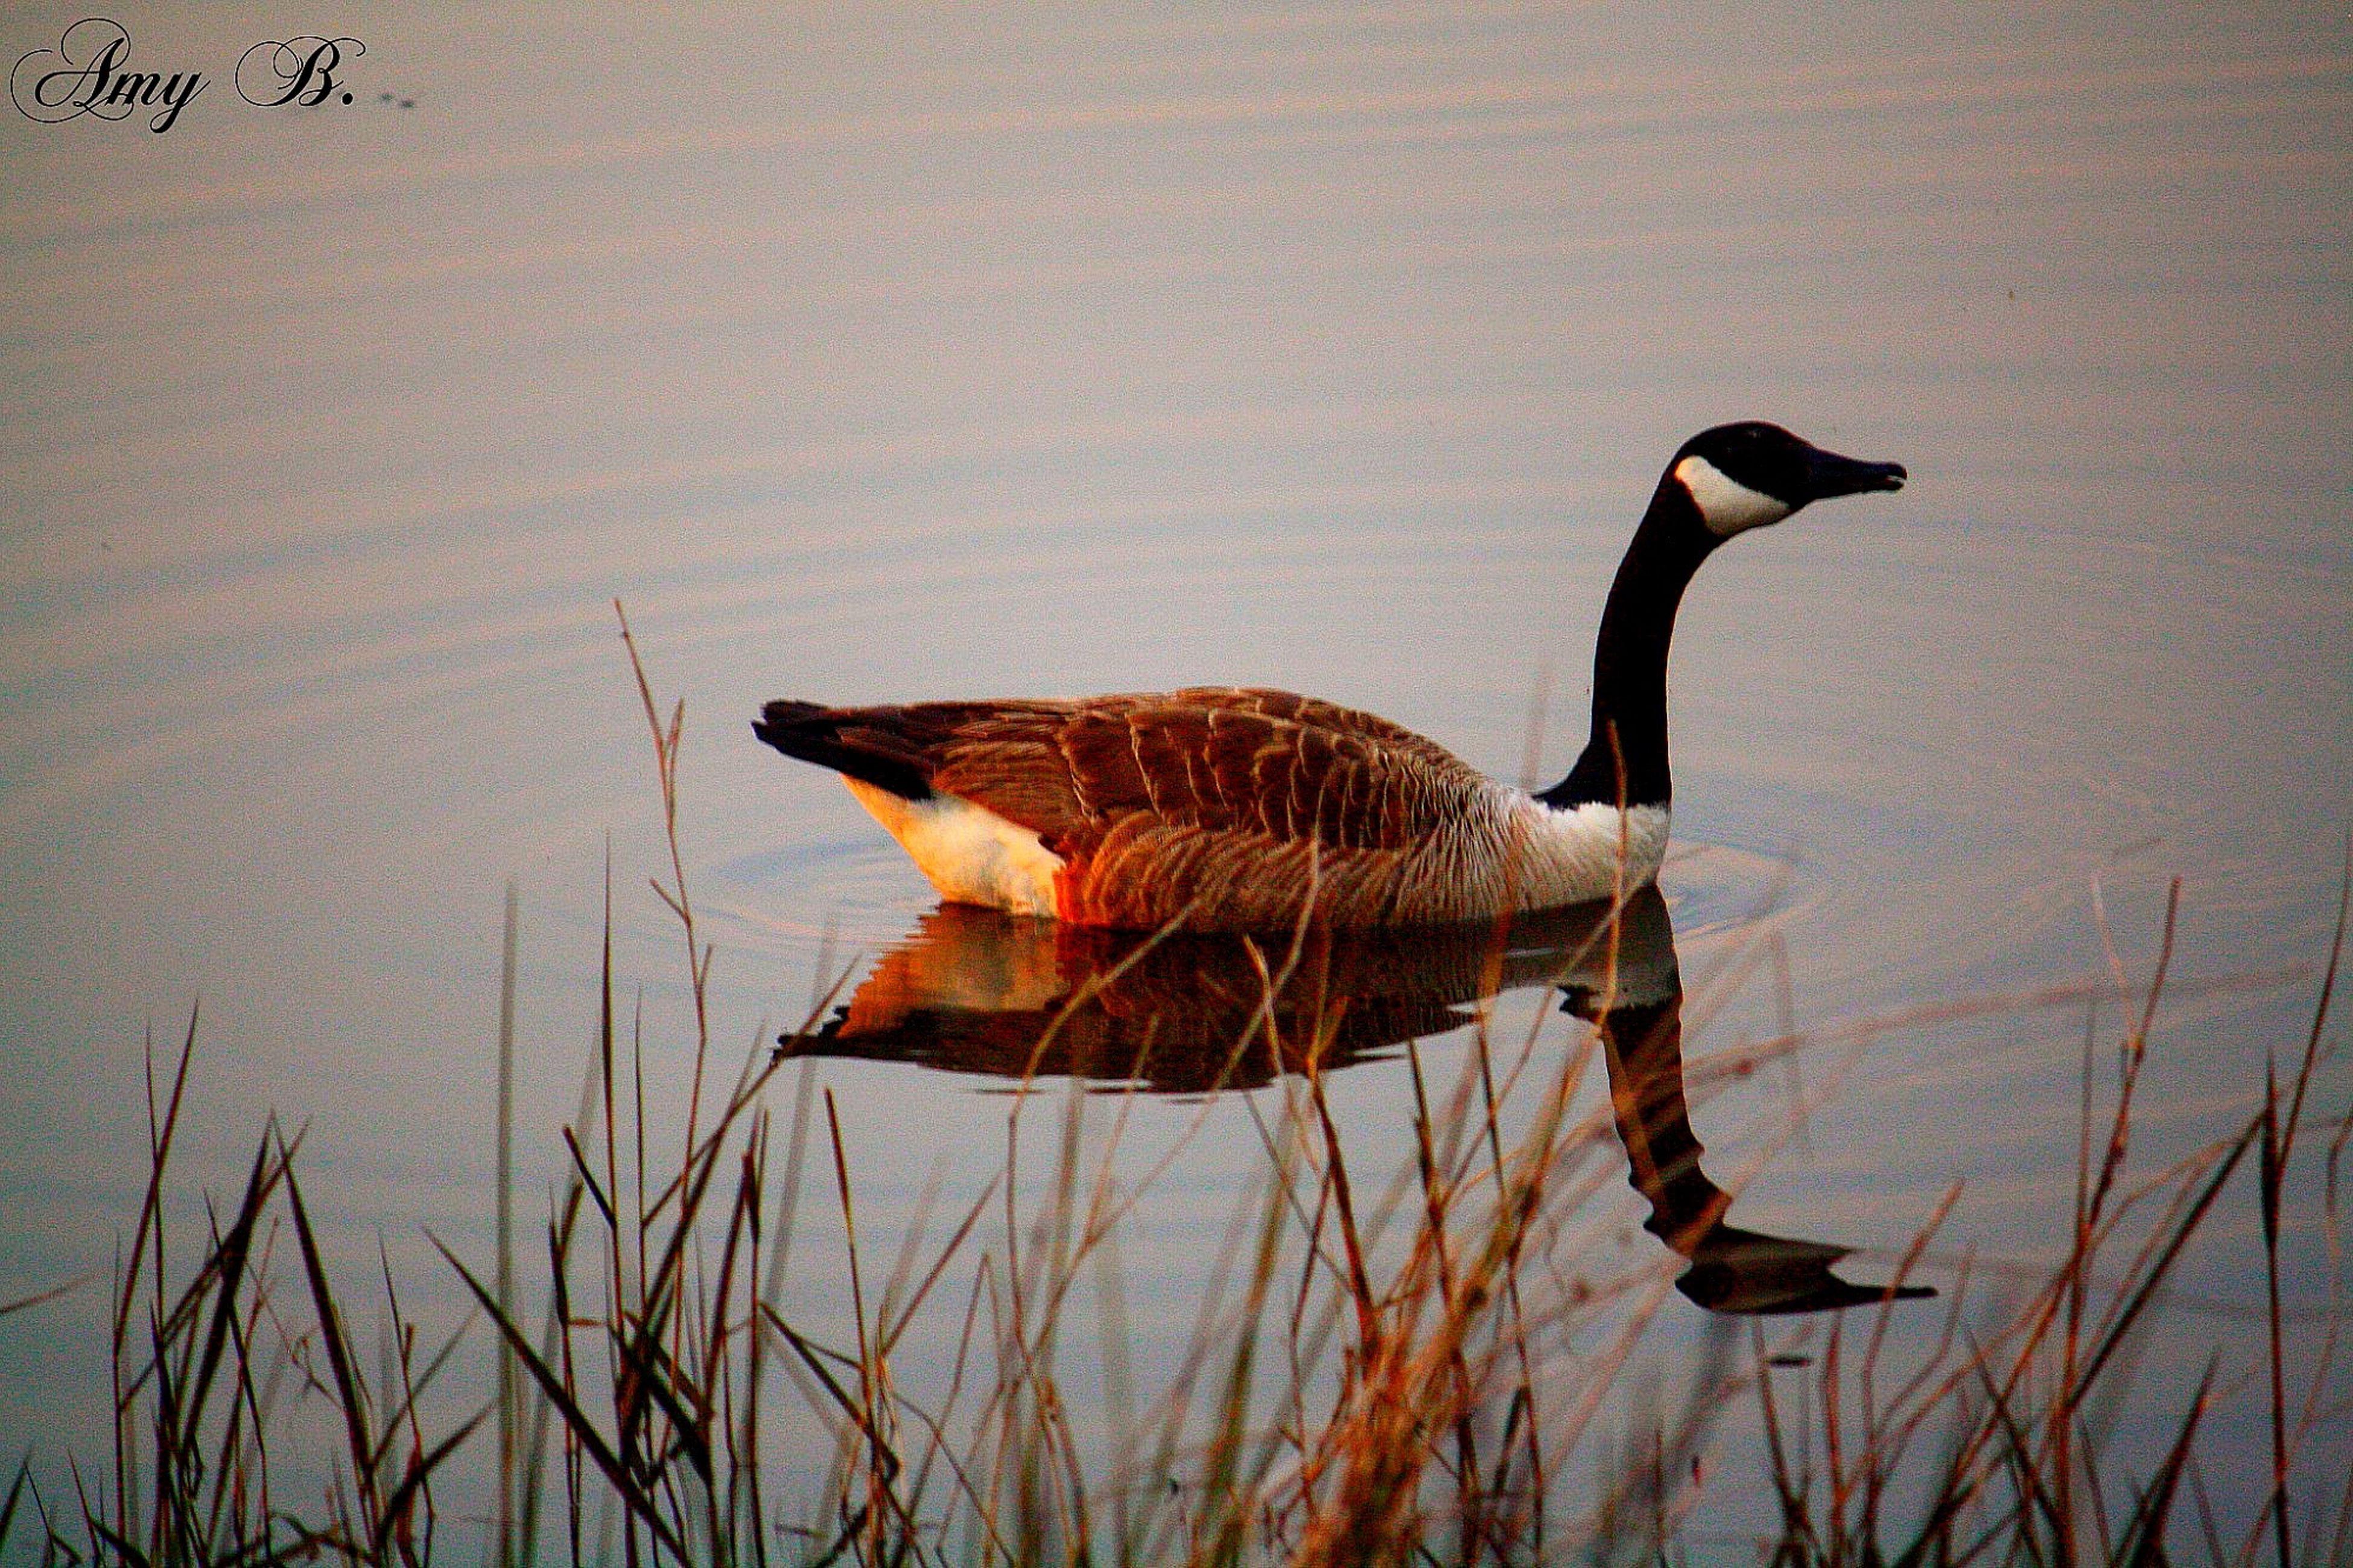 Canadian Geese EyeEm Nature Lover Birds Of EyeEm  Bird Photography Nature Birdwatching Birds Water Reflections